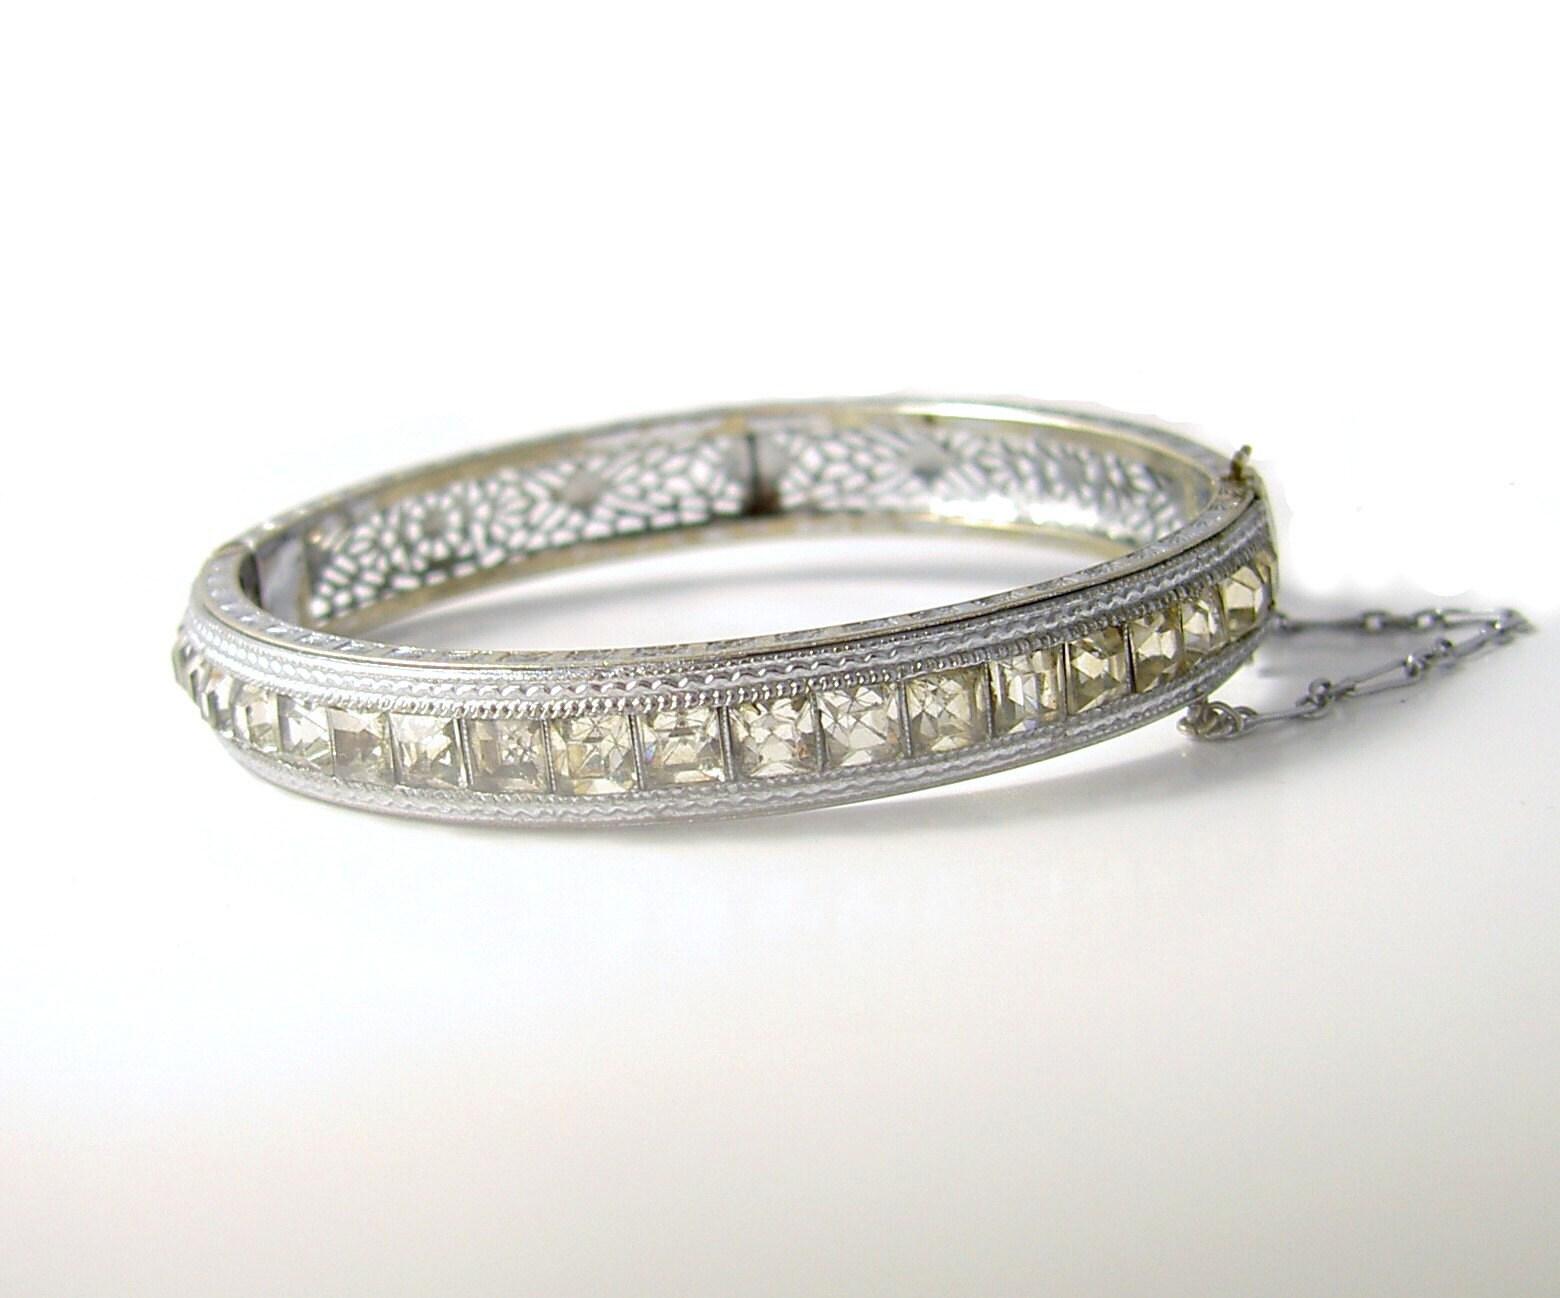 Vintage Signed ALLCO 1930s Art DECO Rhodium Rhinestone Cuff Bracelet